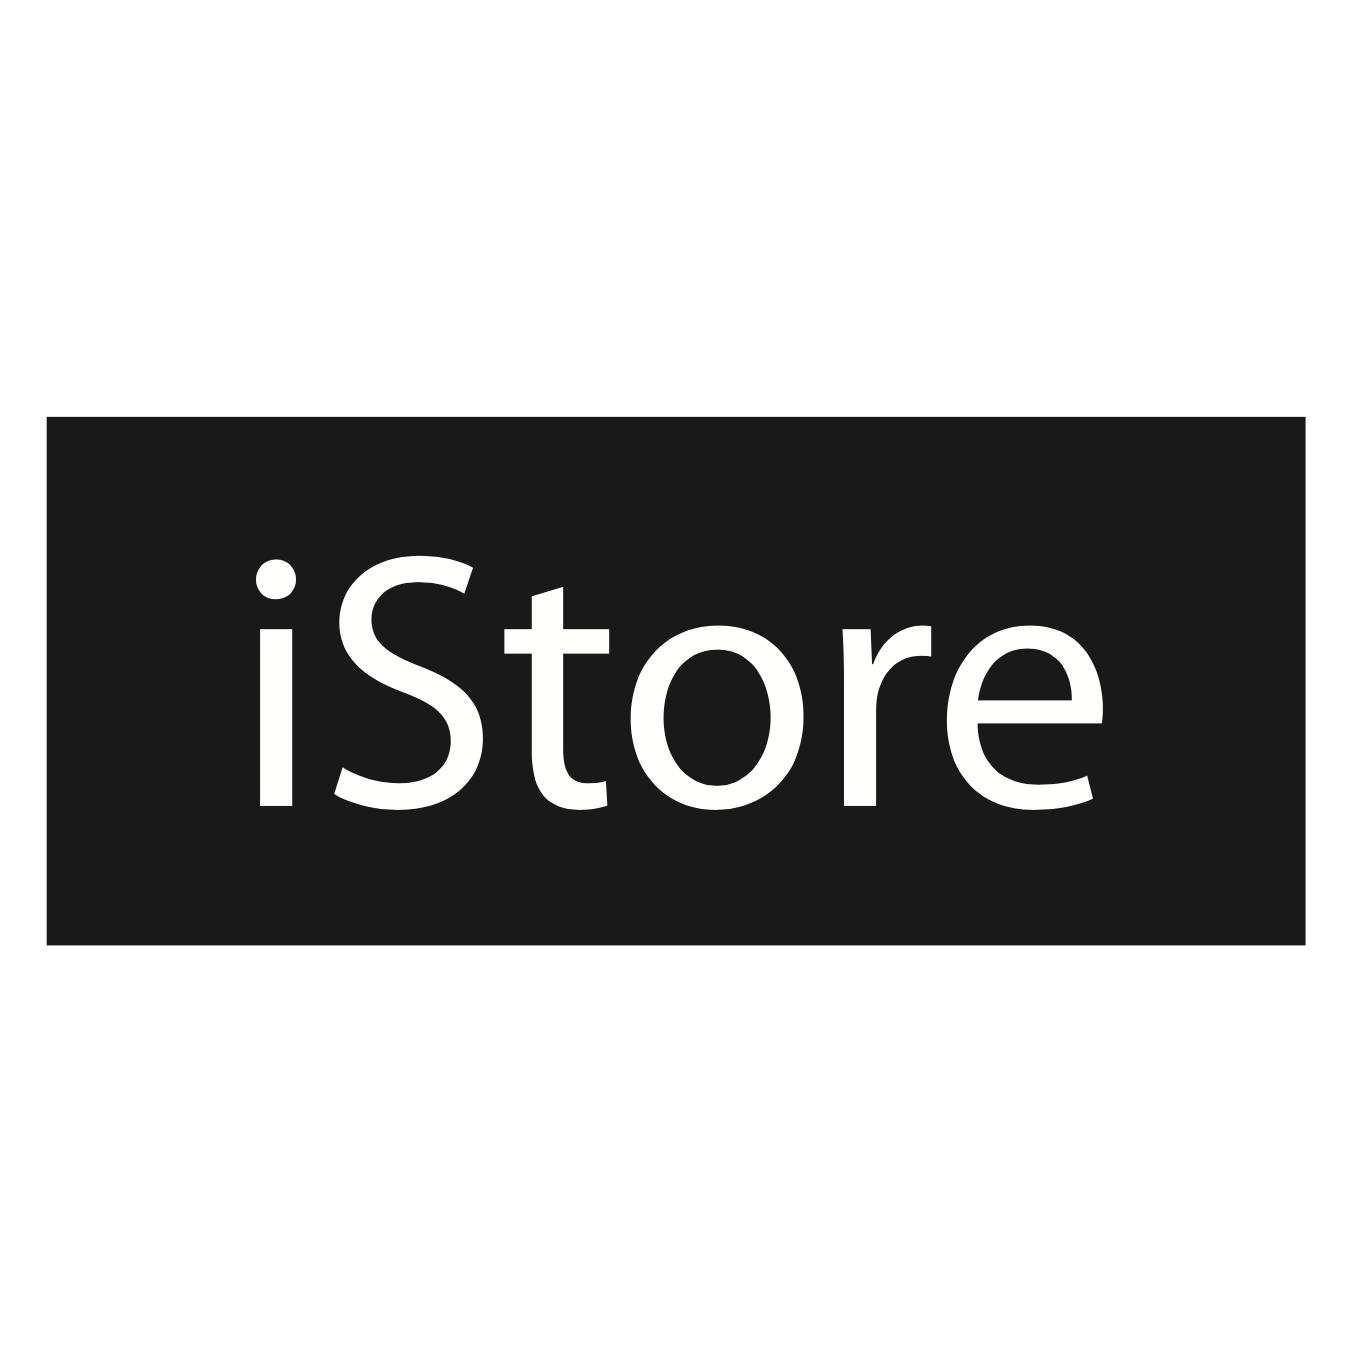 iPhone 6s Plus Leather Case - Marigold